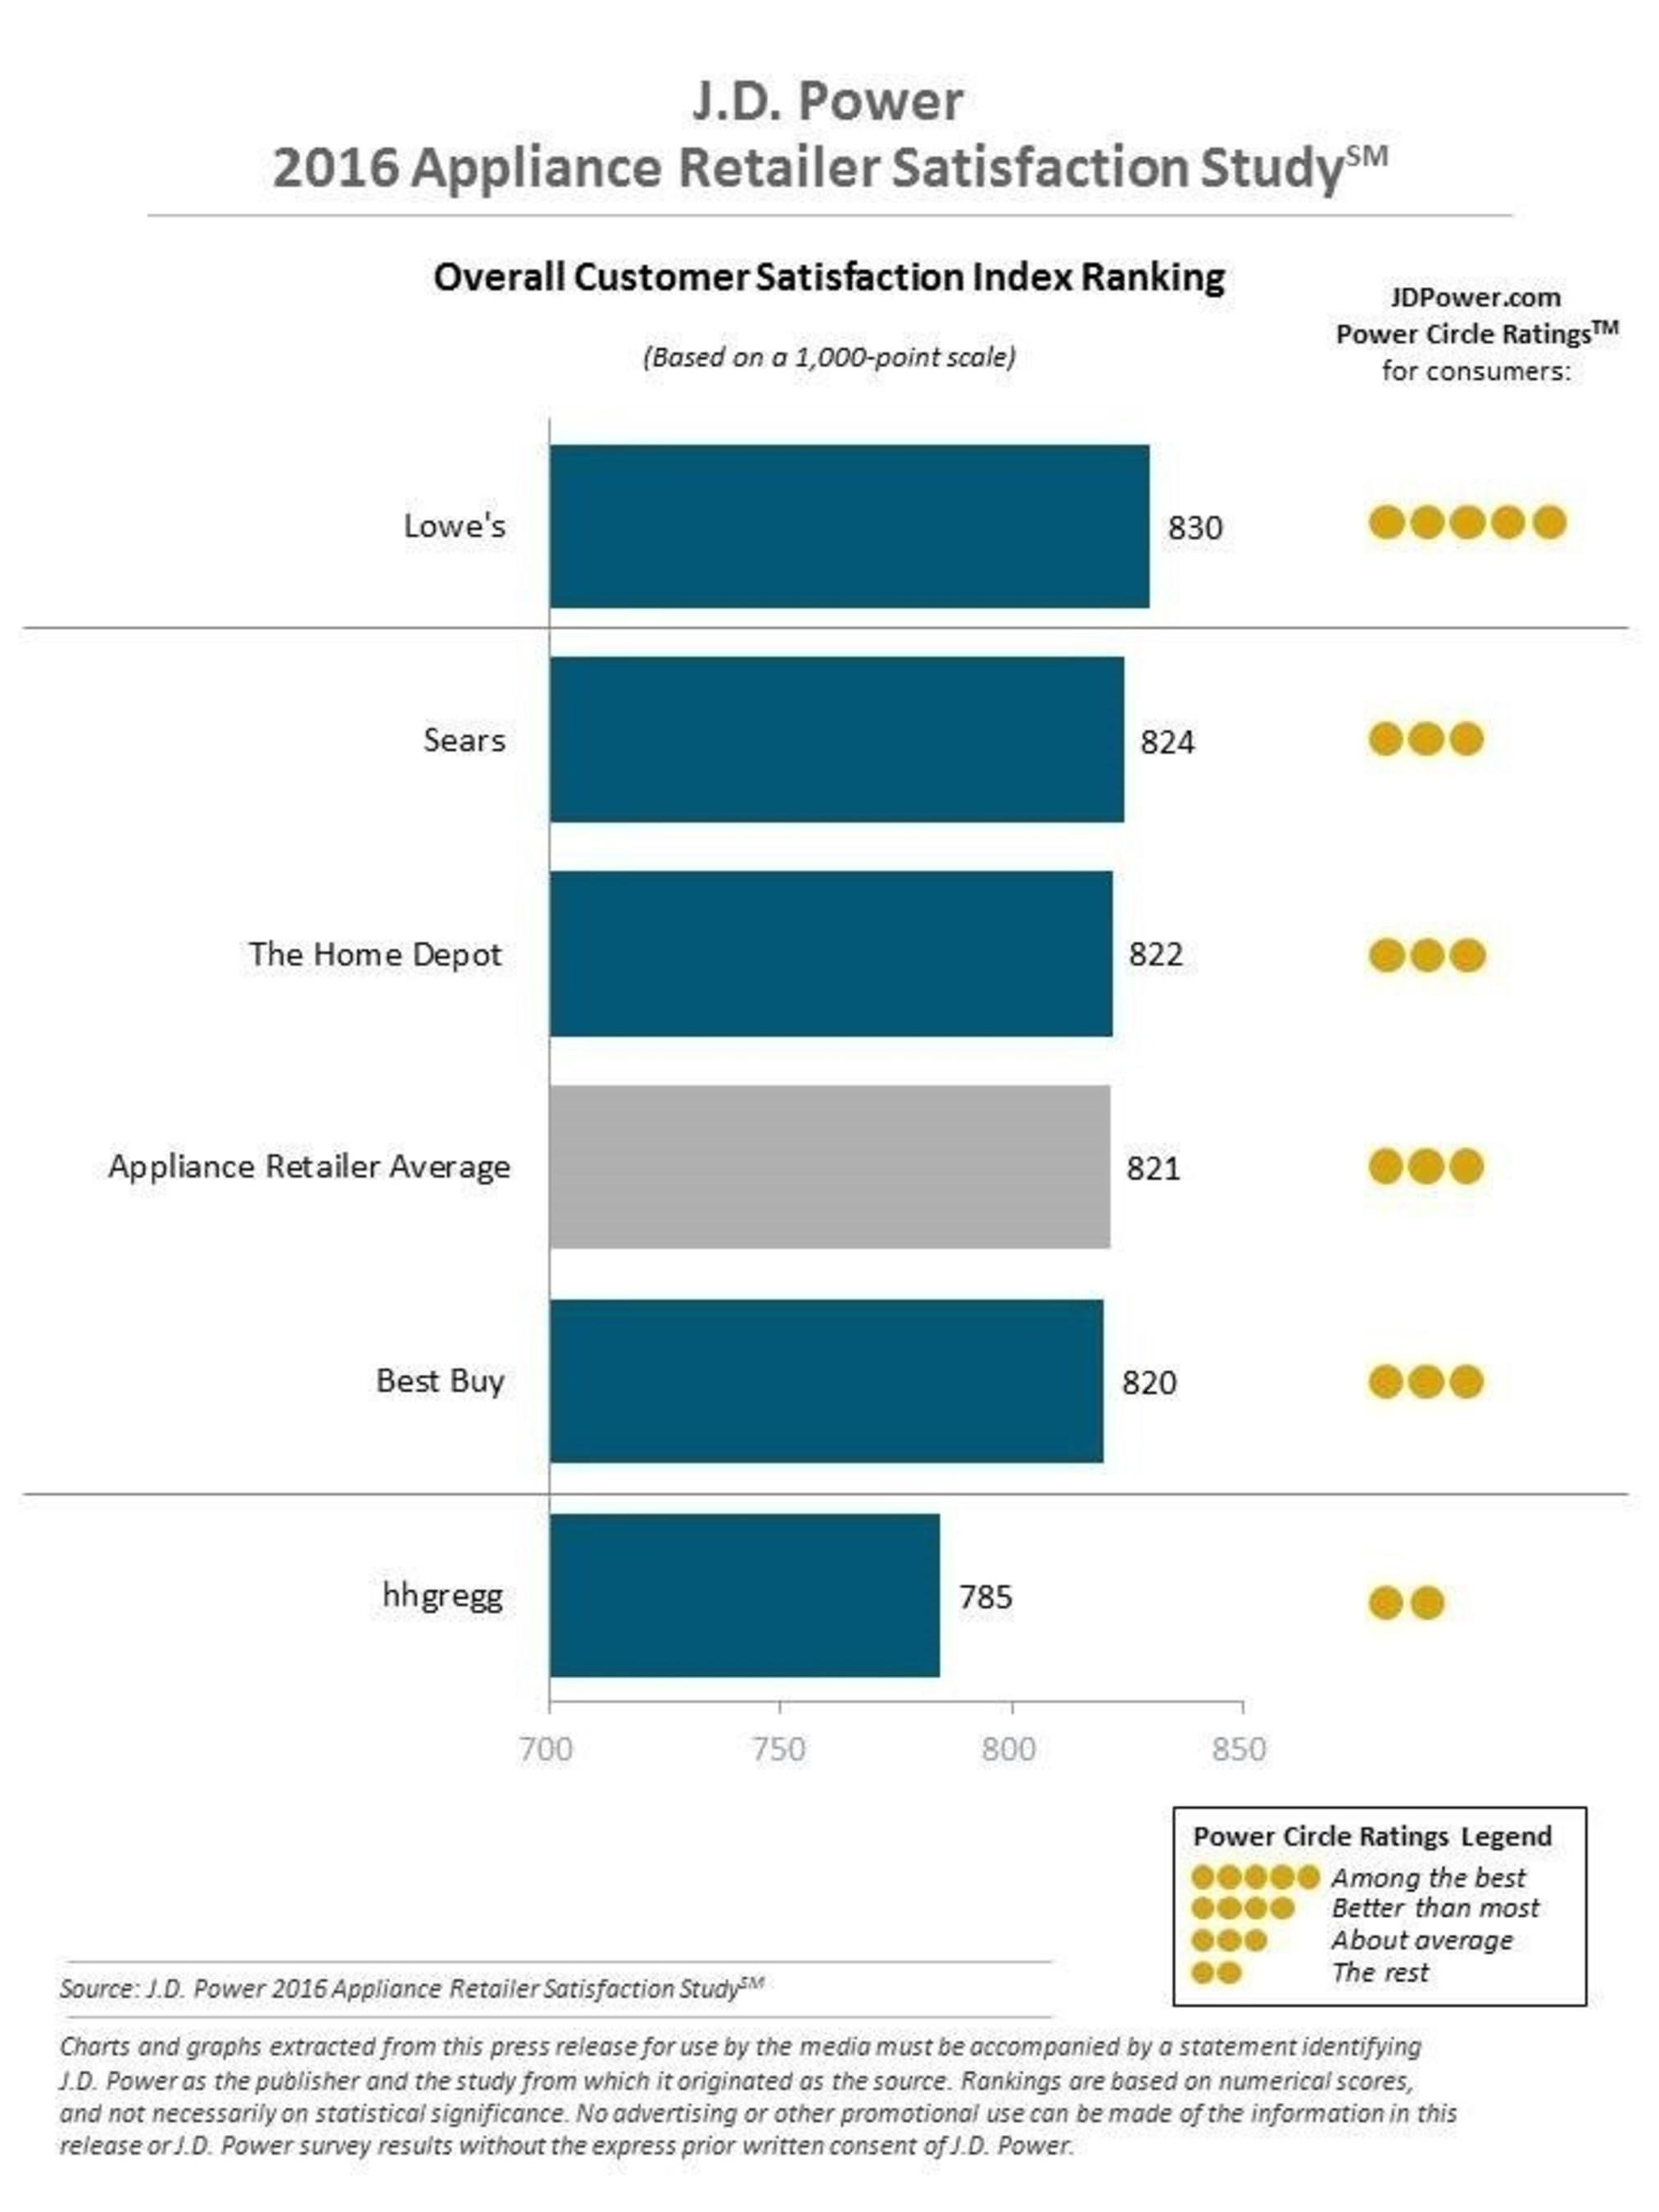 J.D. Power 2016 Appliance Retailer Satisfaction Study(SM)